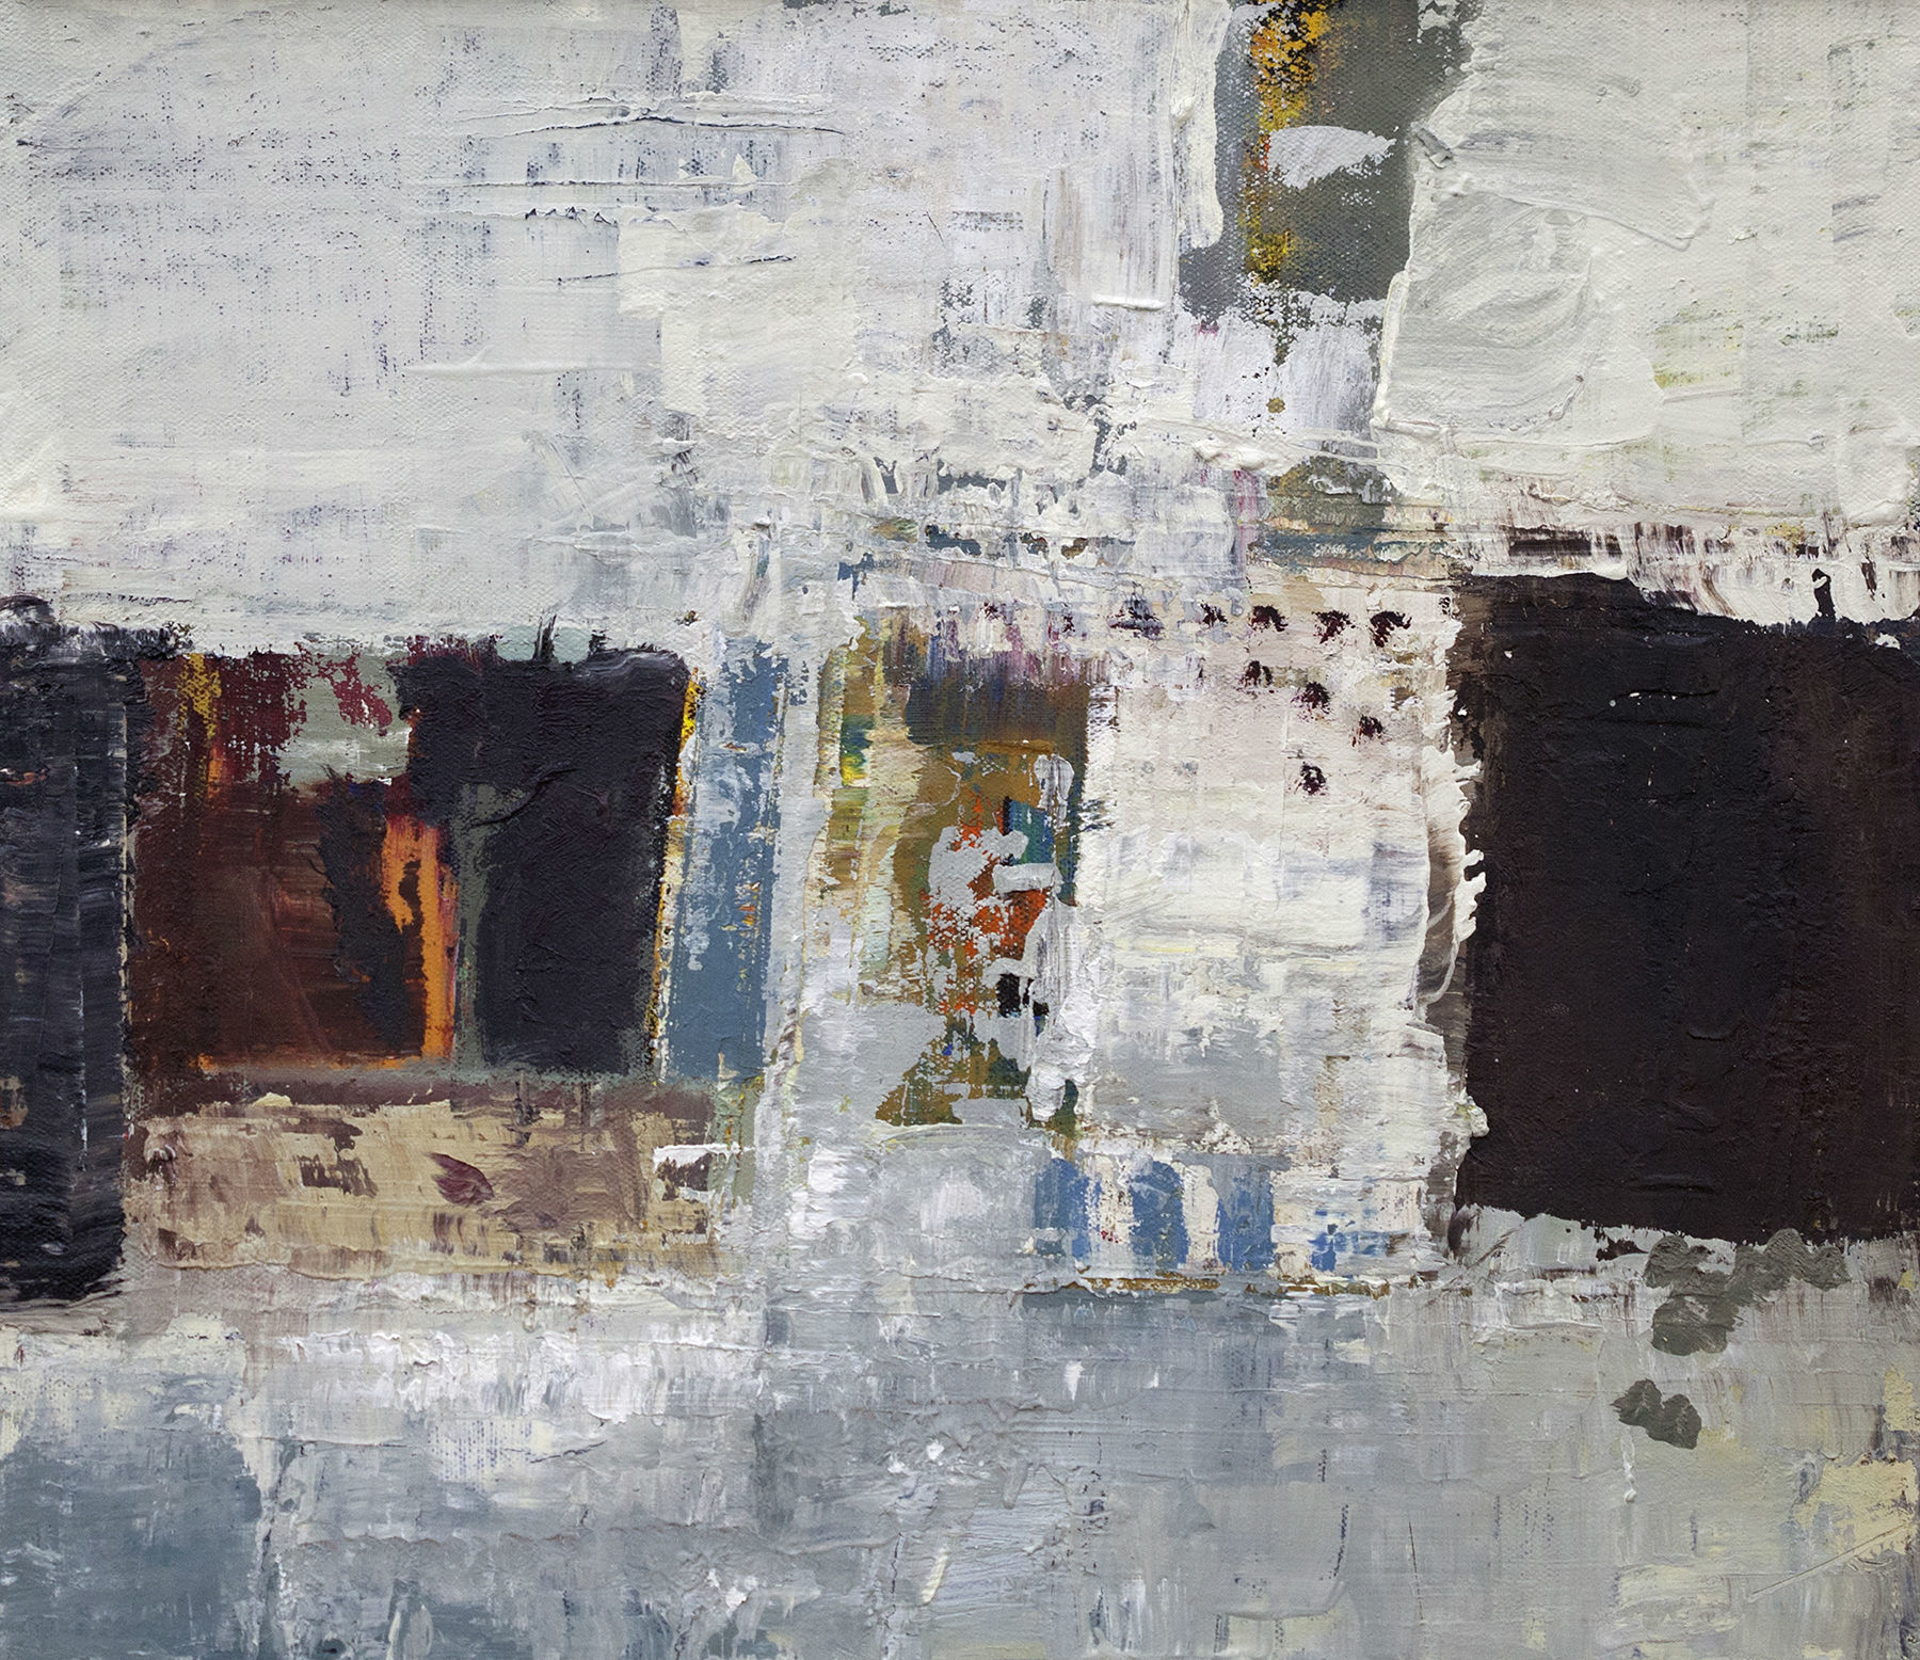 Layers by John McCaw